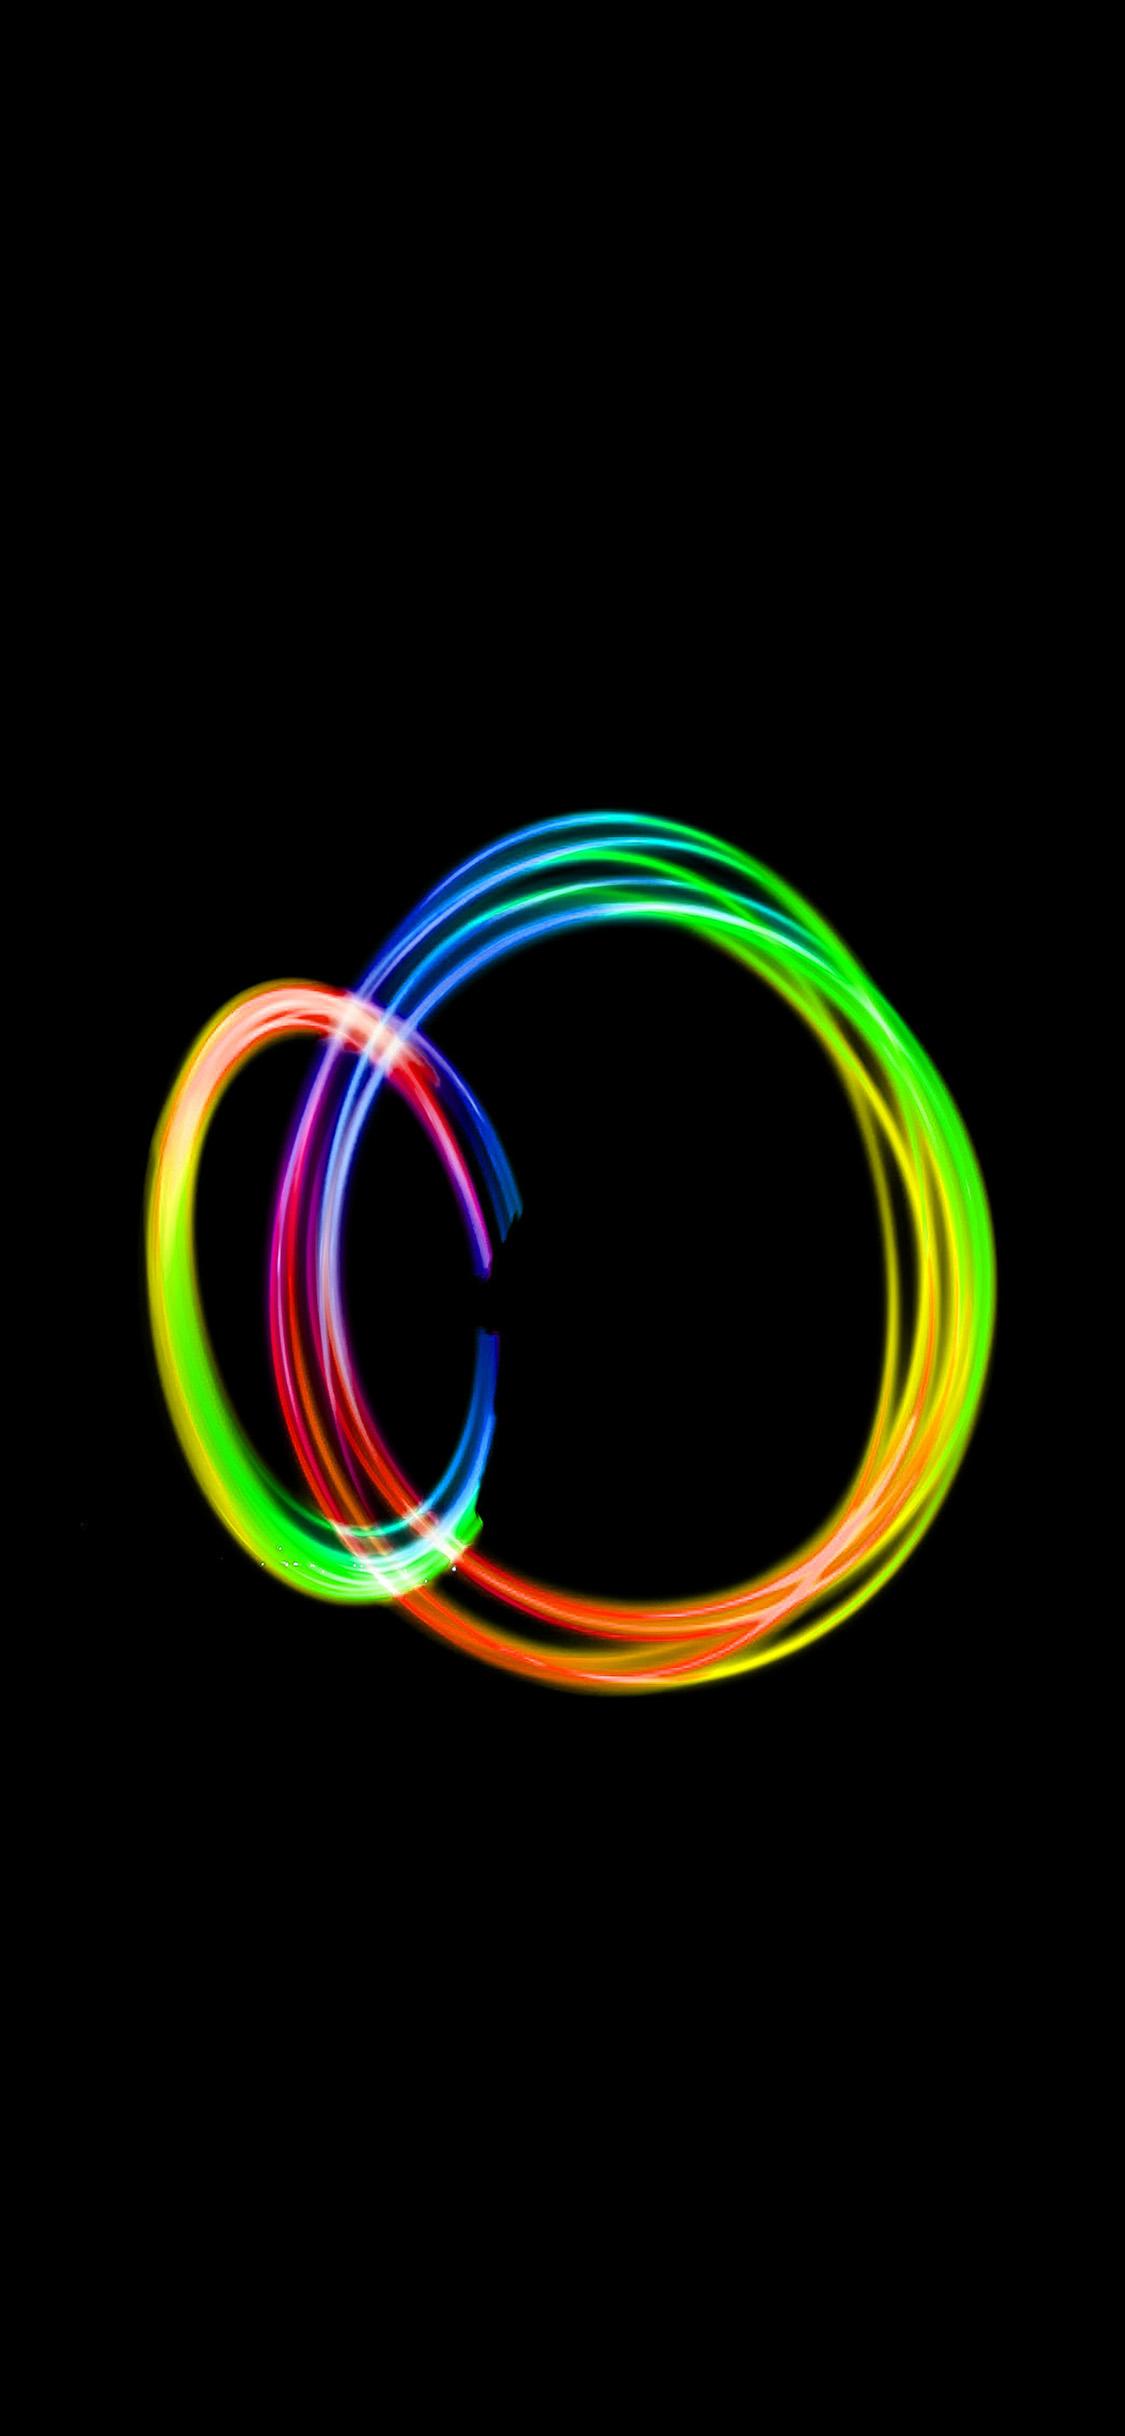 iPhonexpapers.com-Apple-iPhone-wallpaper-bf14-dark-circle-rainbow-art-minimal